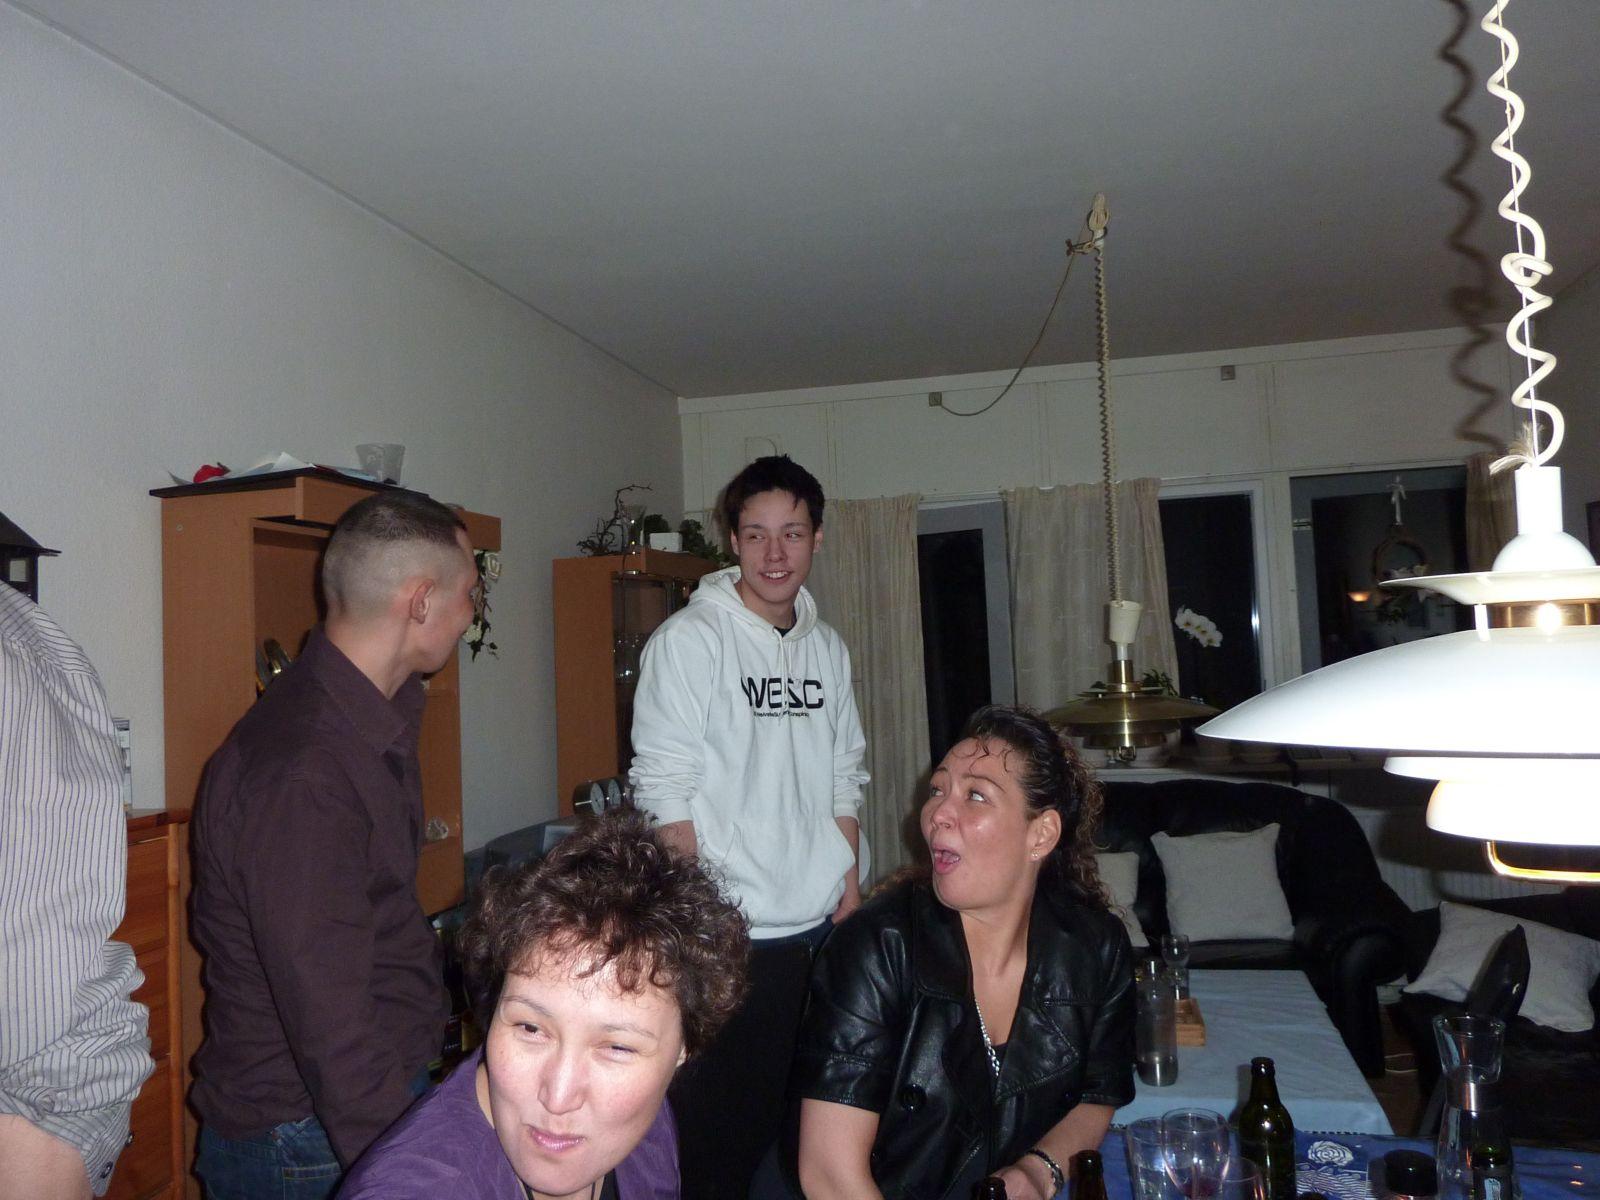 2010-03-14-0300_-_Diana Larsen; Peters_Kone